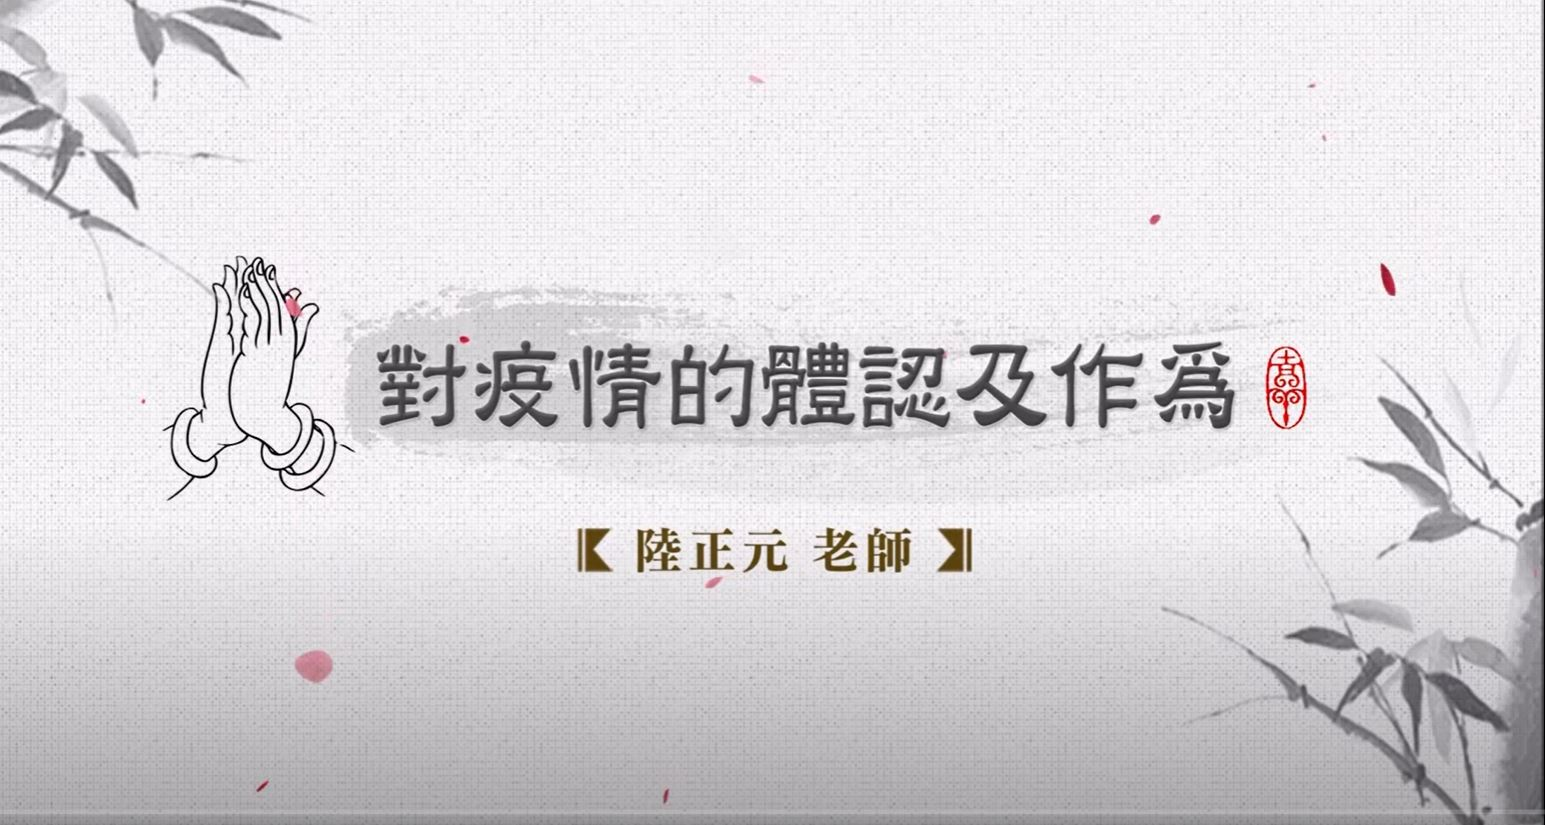 Encouragement From Teacher Lu